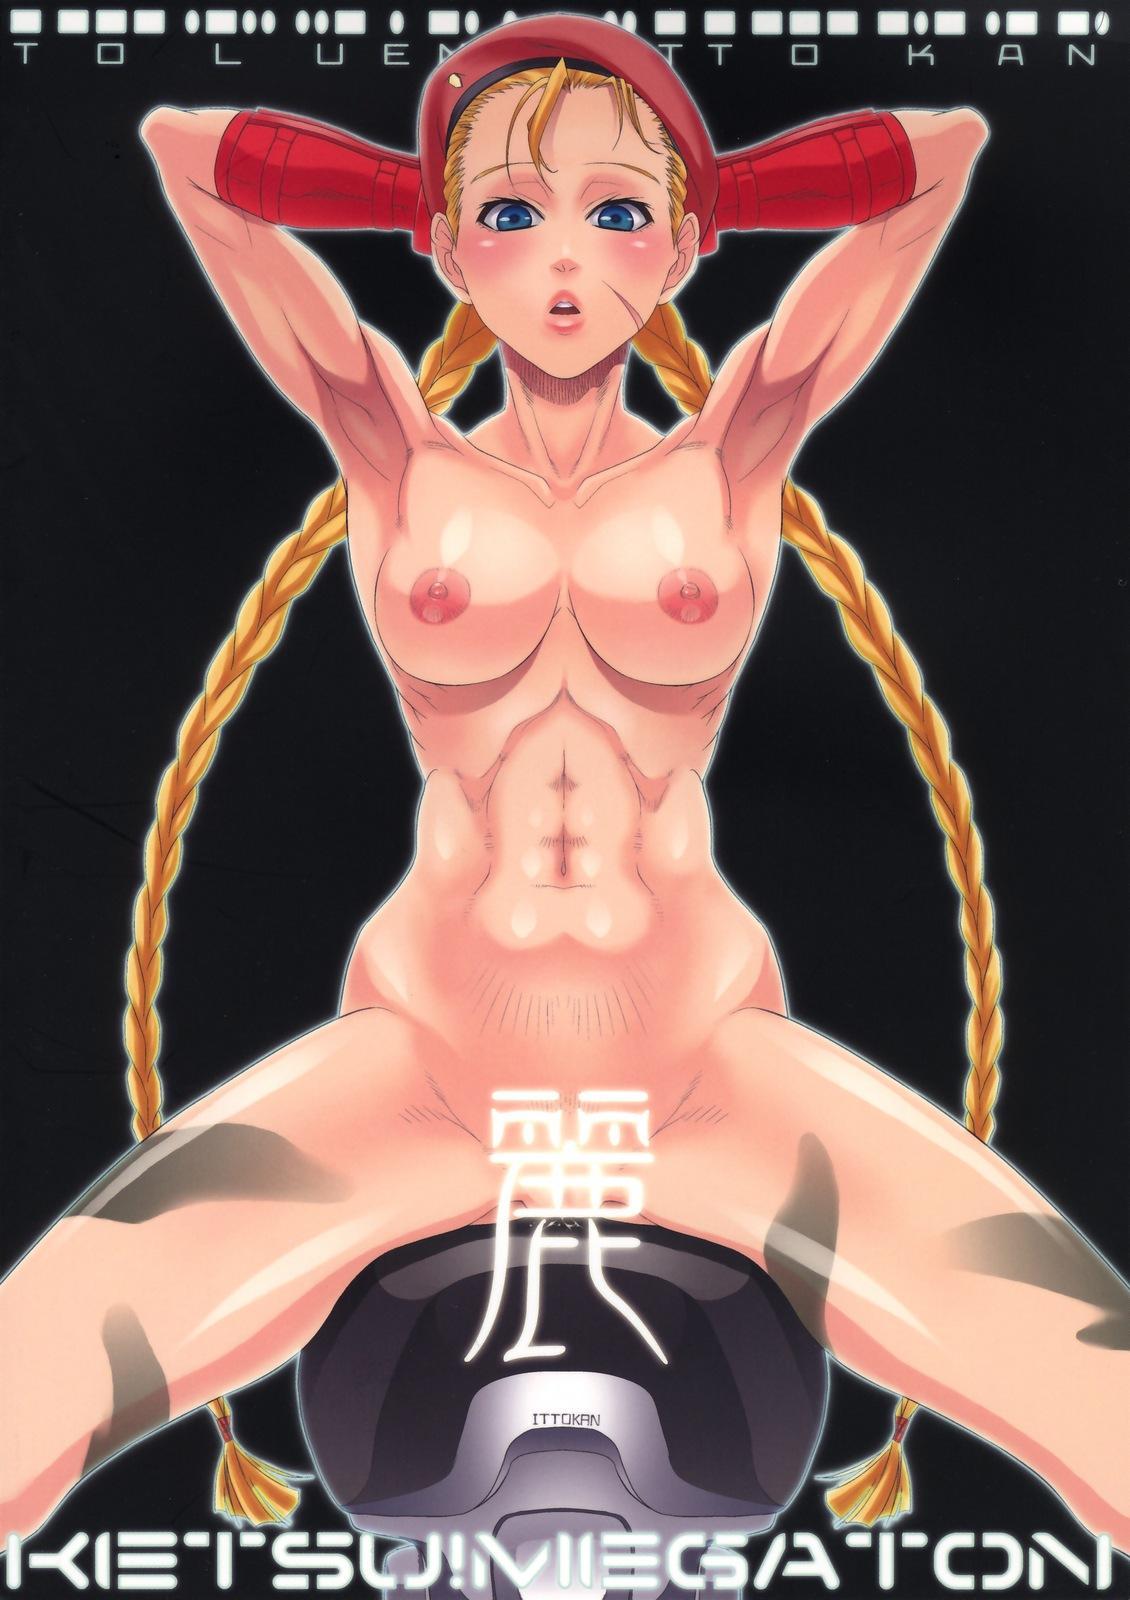 KETSU! MEGATON Chun-li 49